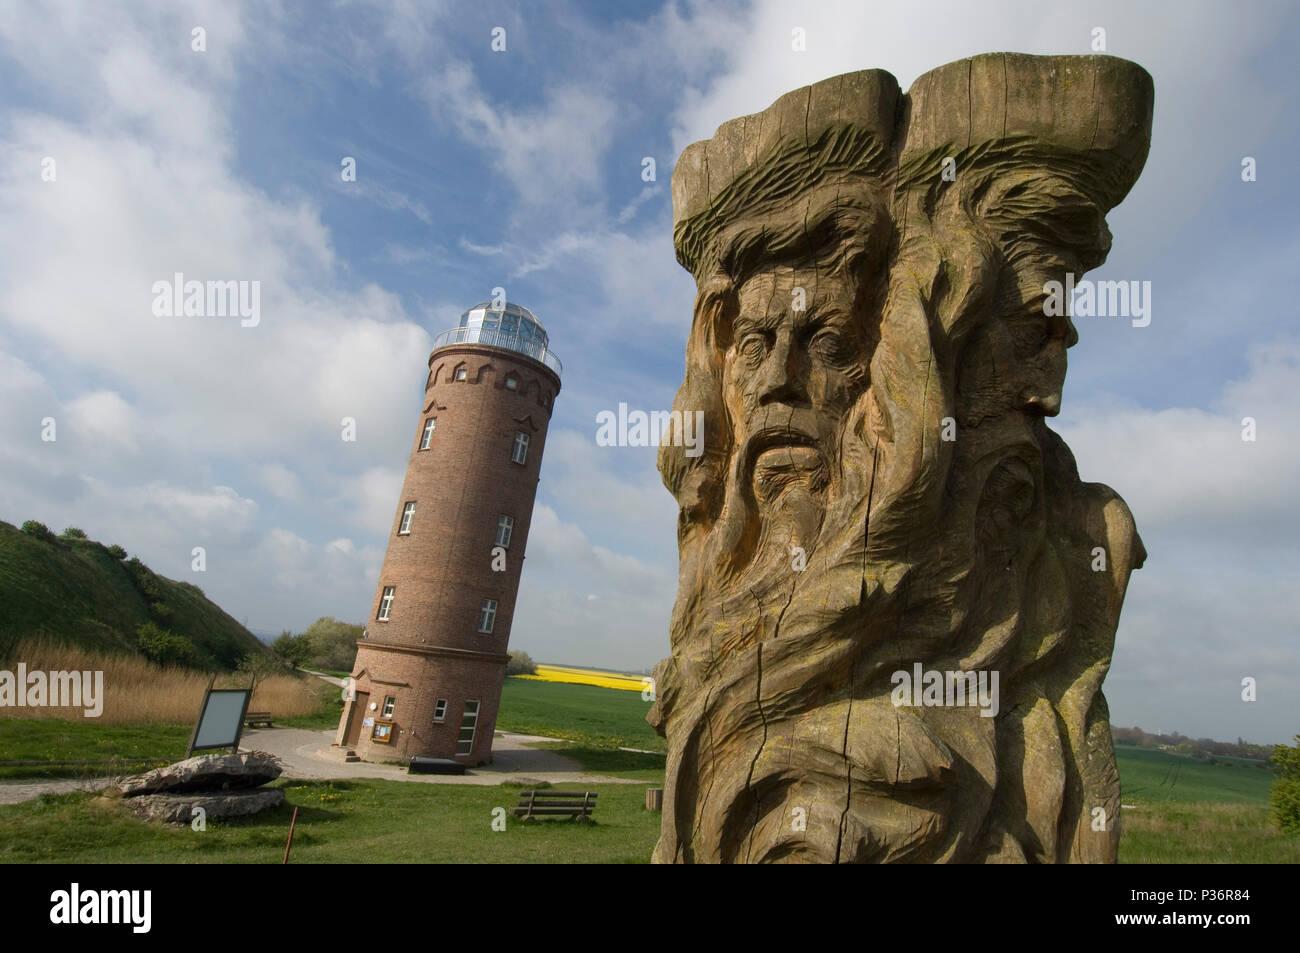 Putgarten, Germany, the Peilturm and the Svantovit statue at Cape Arkona - Stock Image